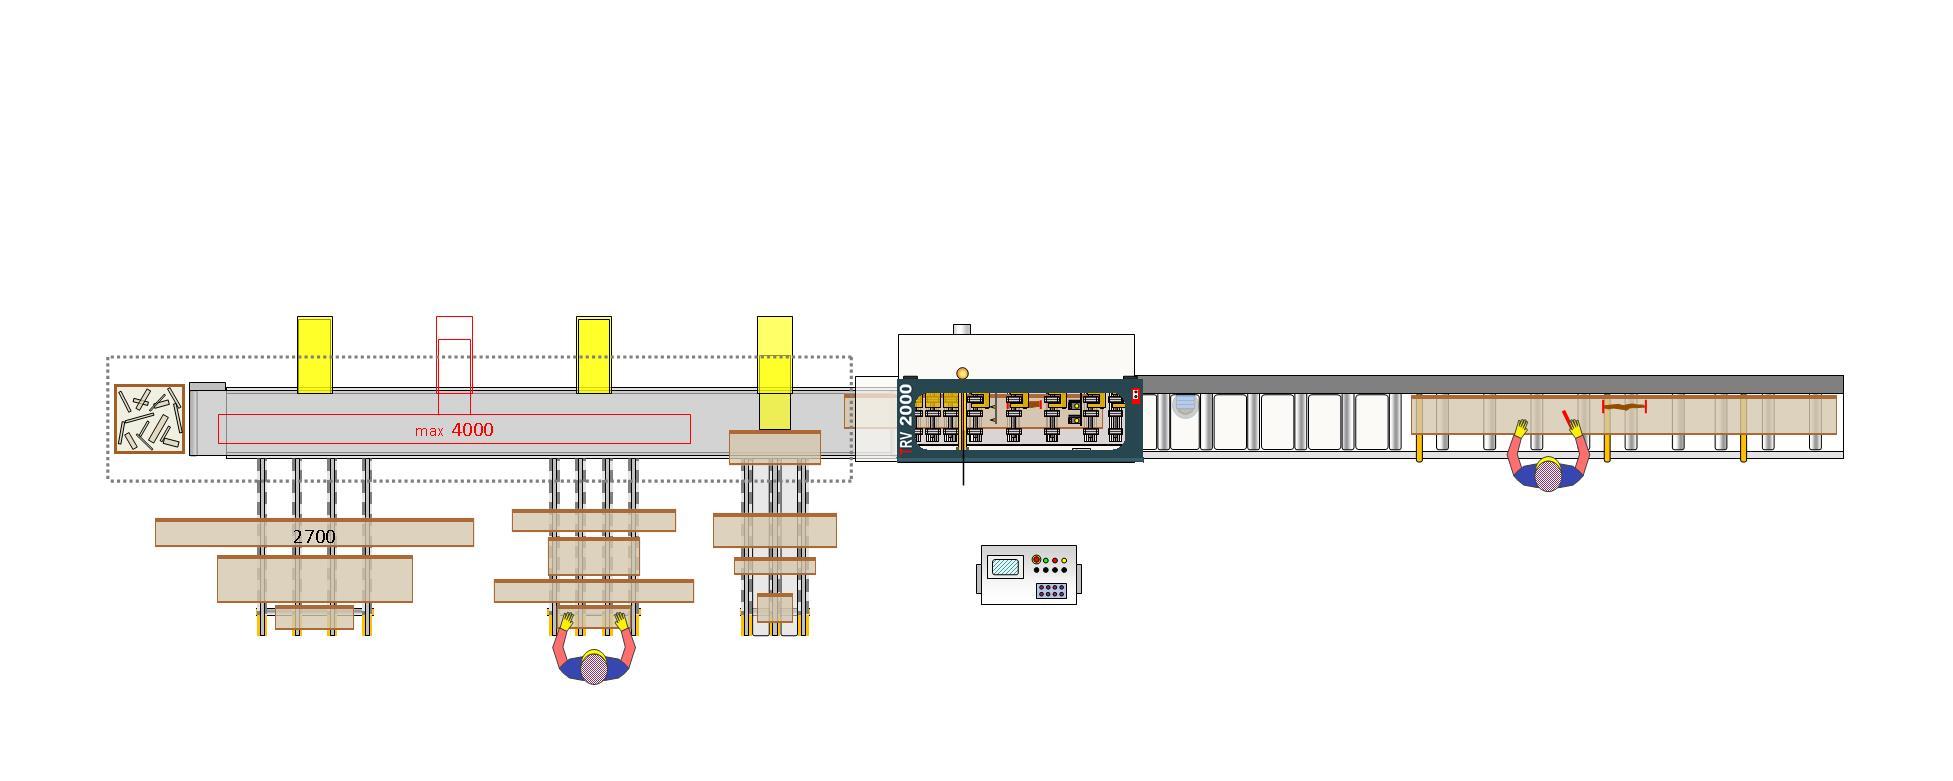 TRV 2000 700R - Concept01